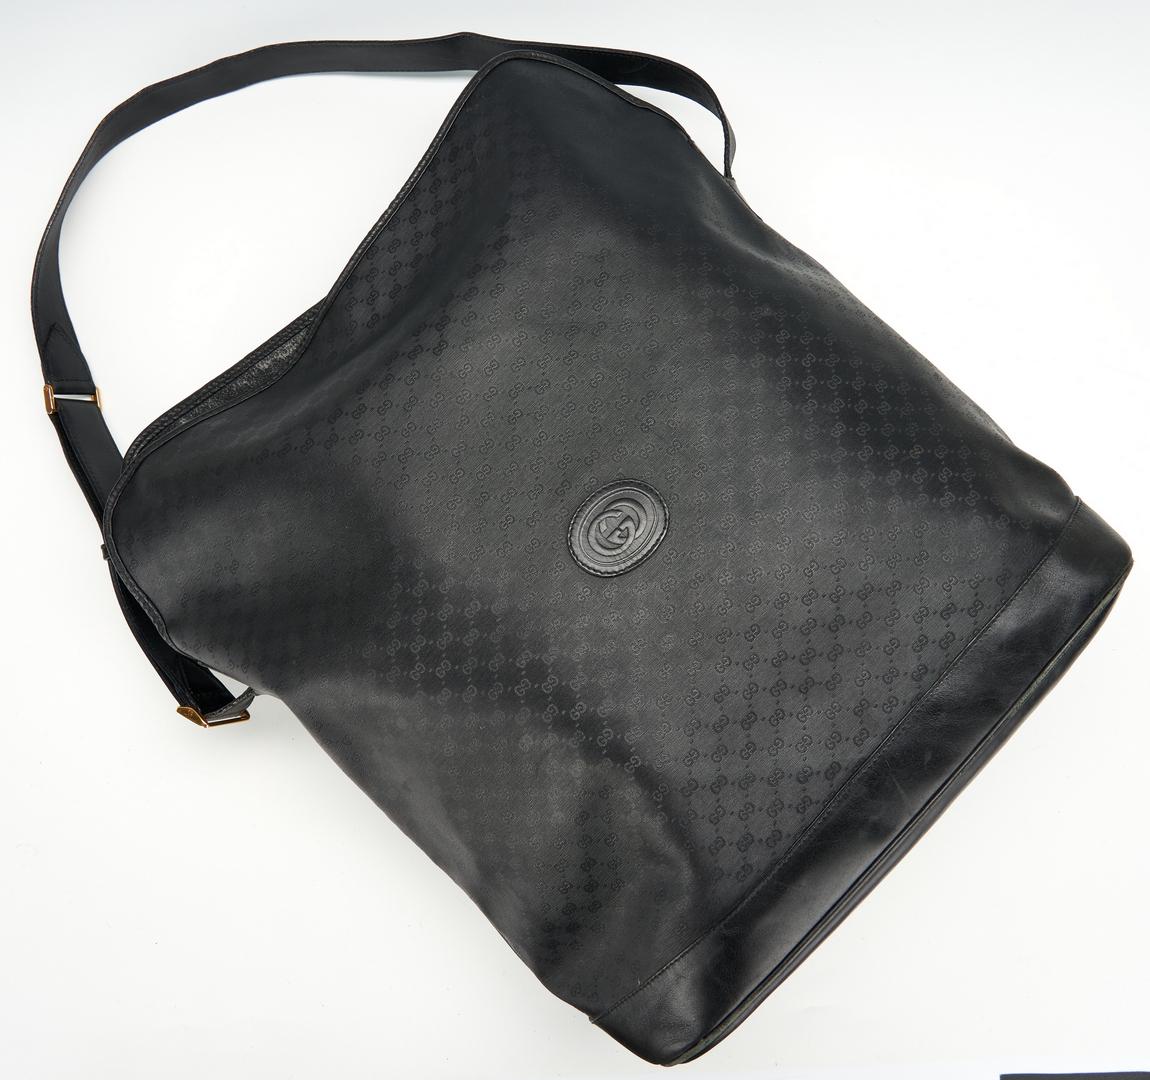 Lot 719: 2 Gucci Monogram Tote Bags & 1 Buckle